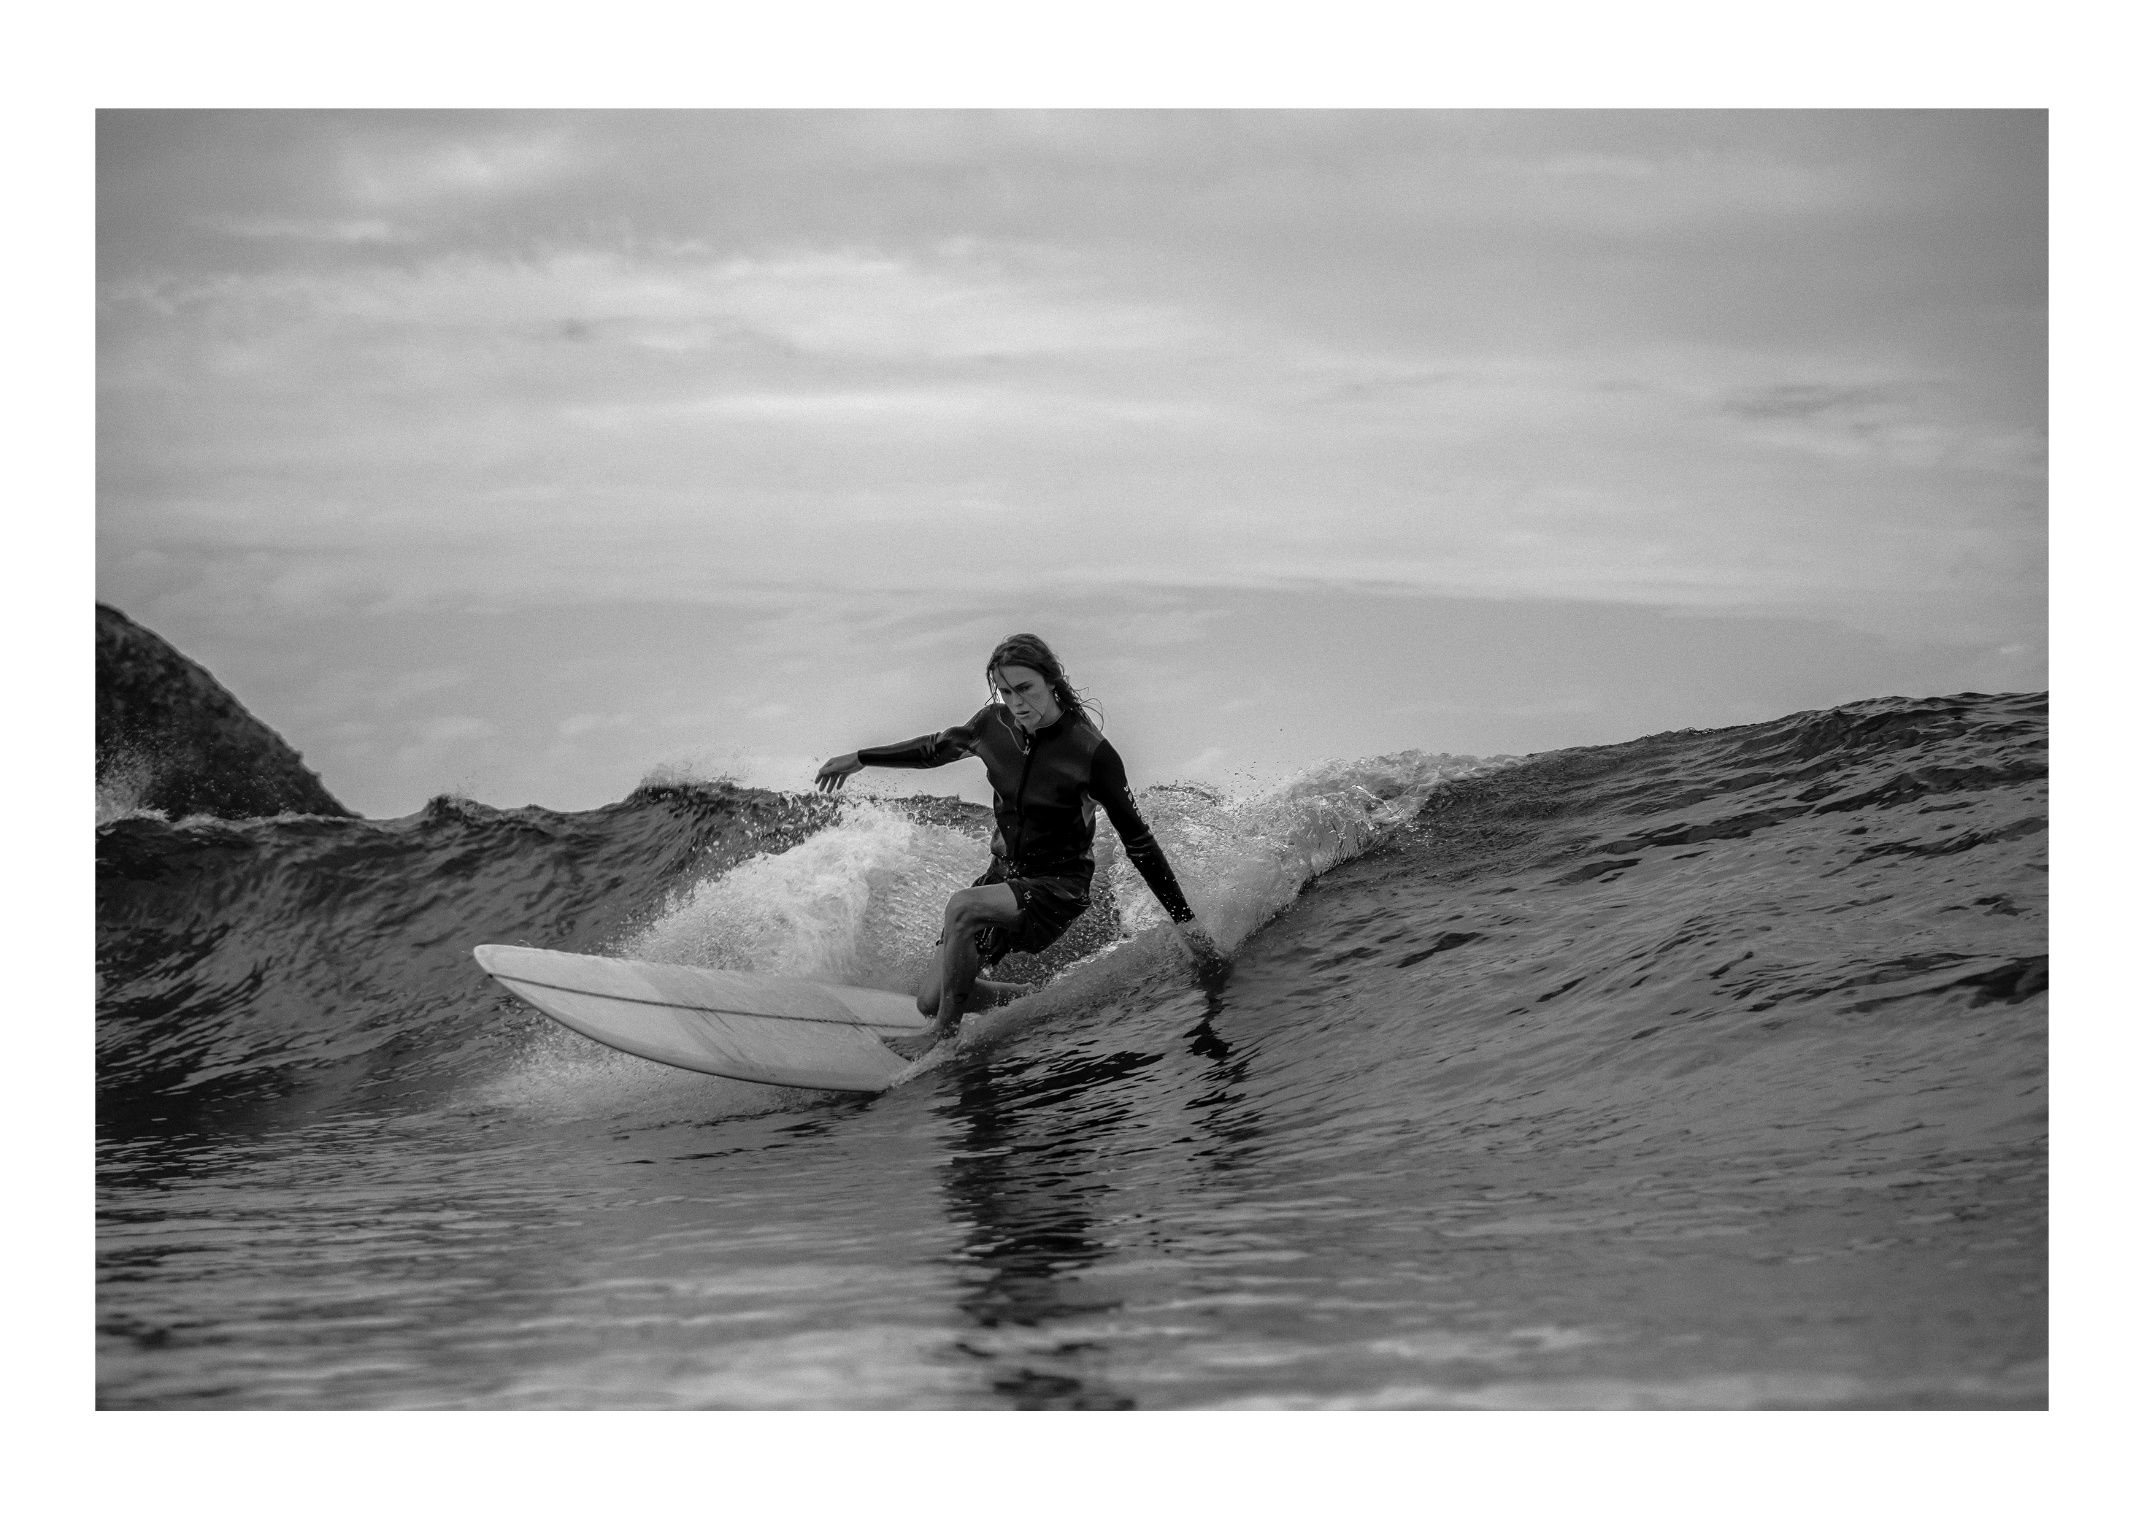 Fabien_voileau_salt_water_byron_bay_surf_Jye_whyatt_3